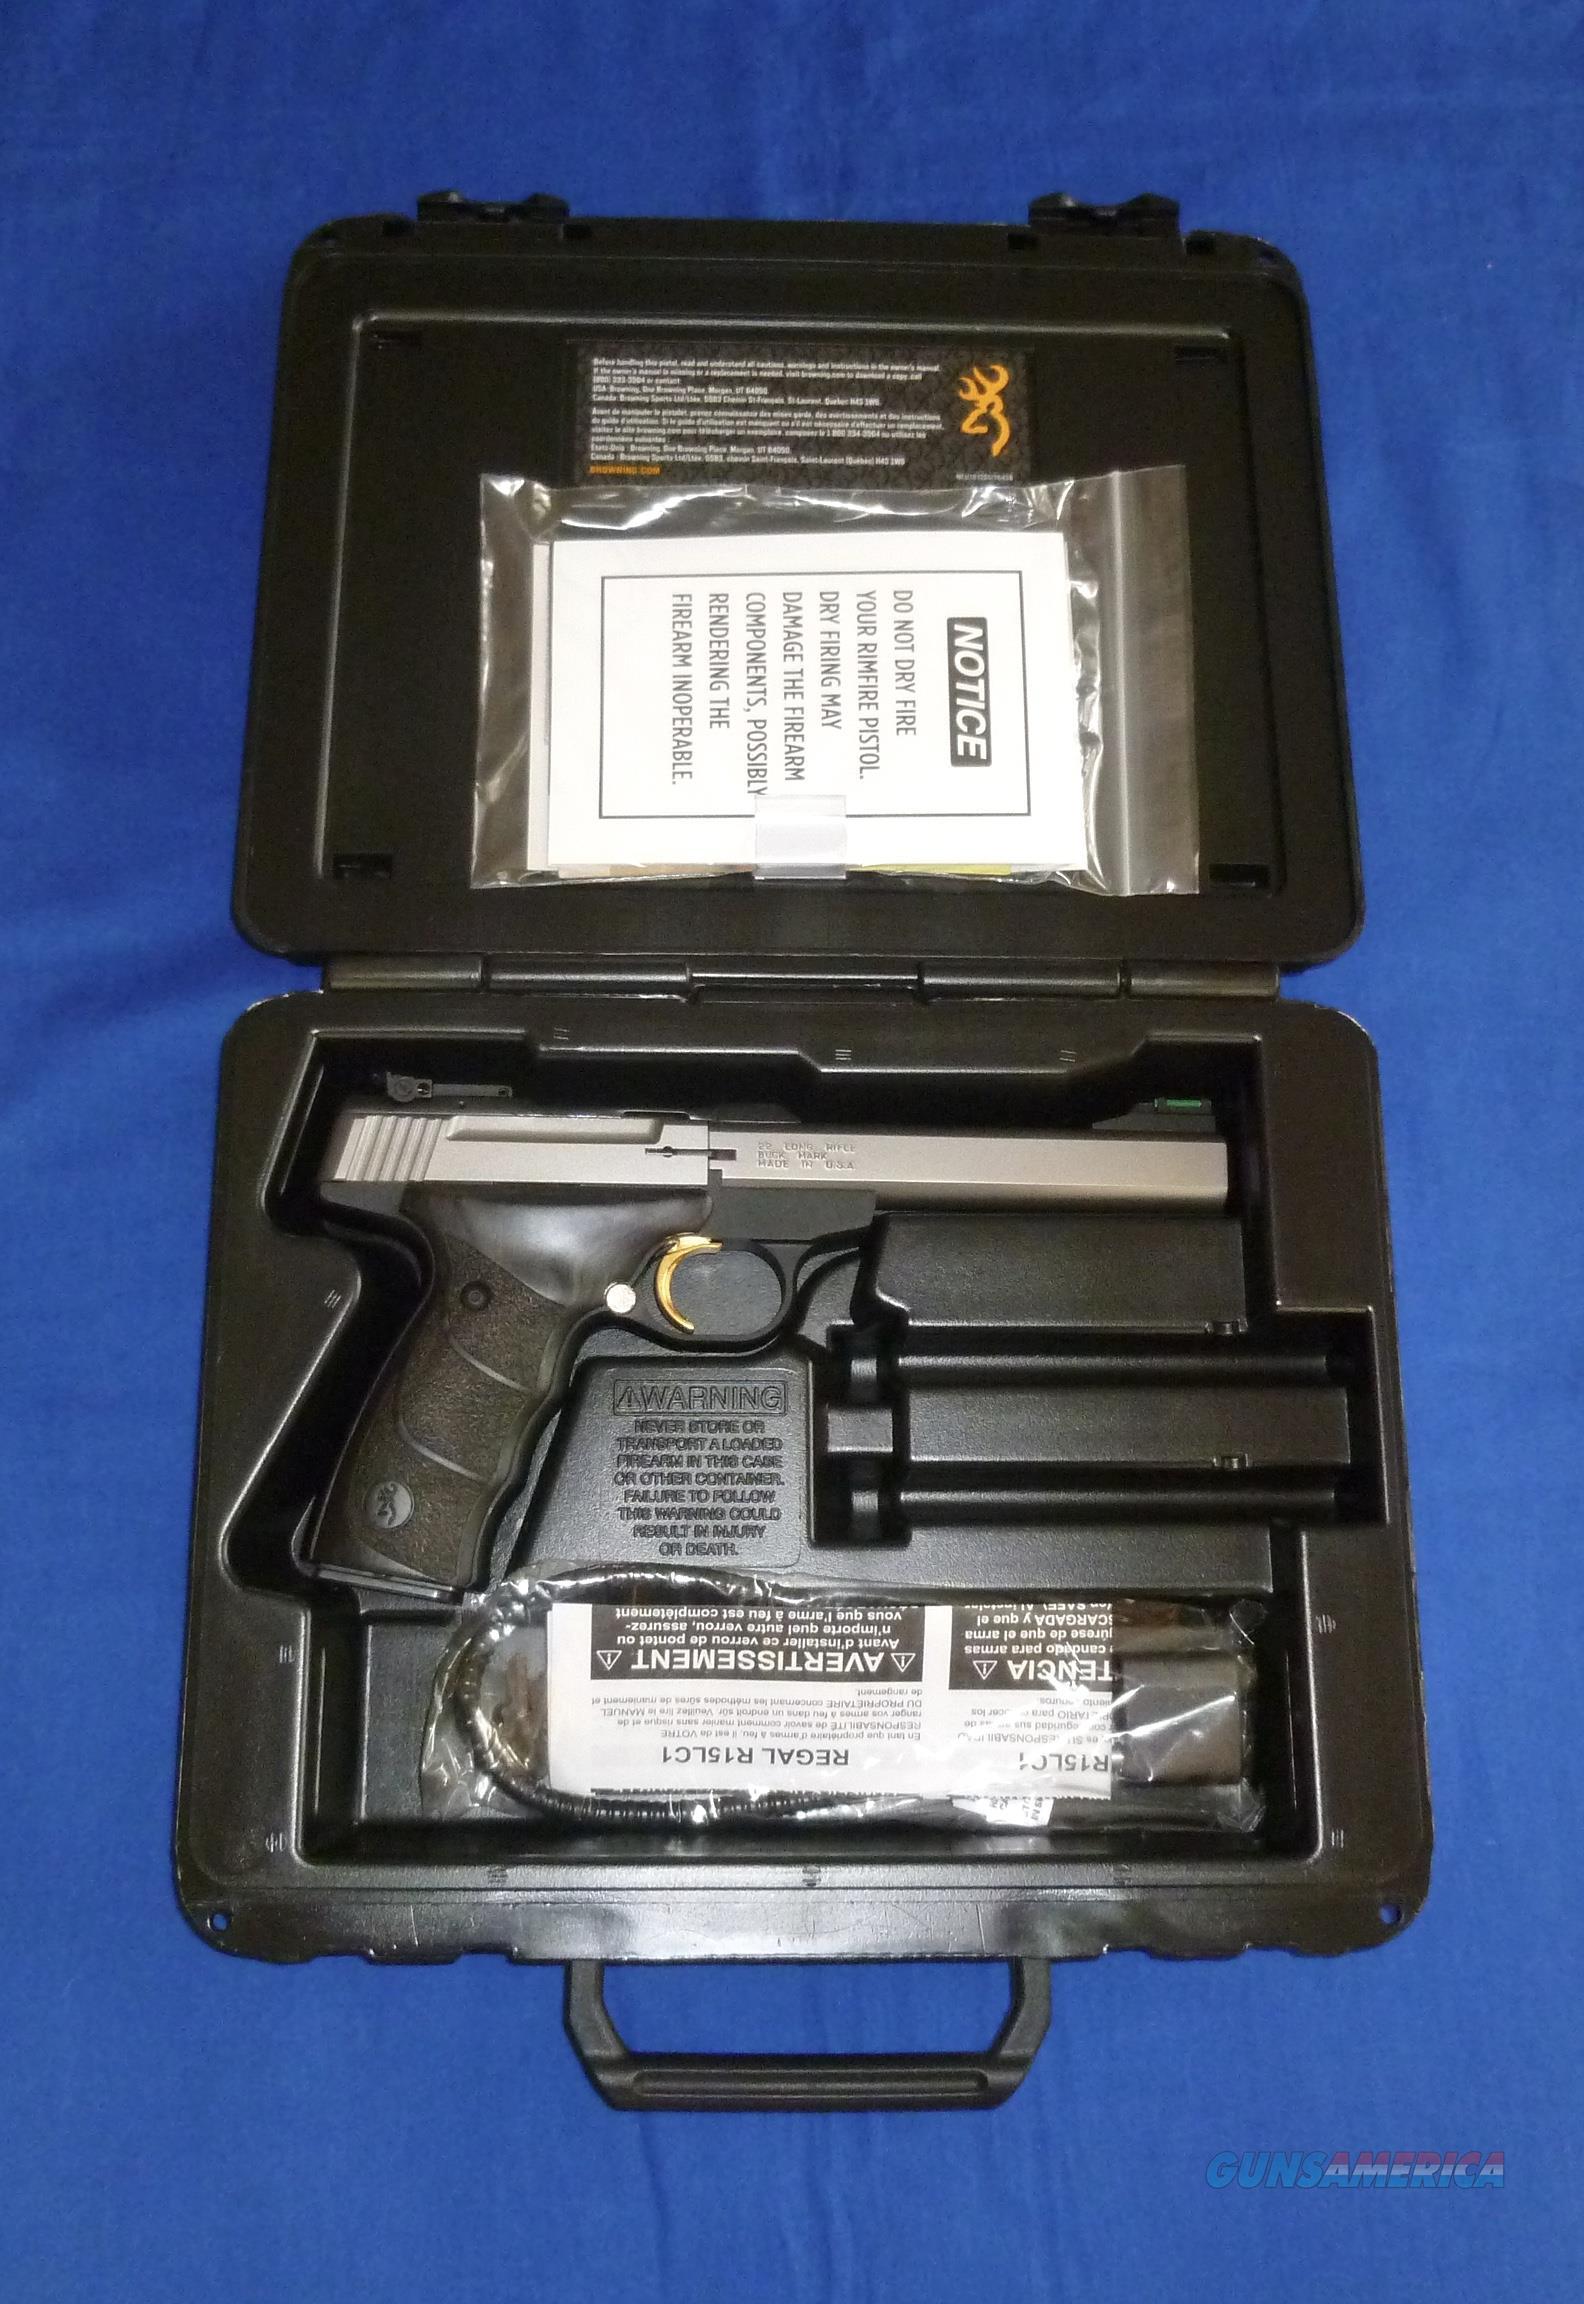 SALE PRICED!  BROWNING BUCK MARK PLUS UDX STAINLESS STEEL 22LR SEMI-AUTO PISTOL  Guns > Pistols > Browning Pistols > Buckmark